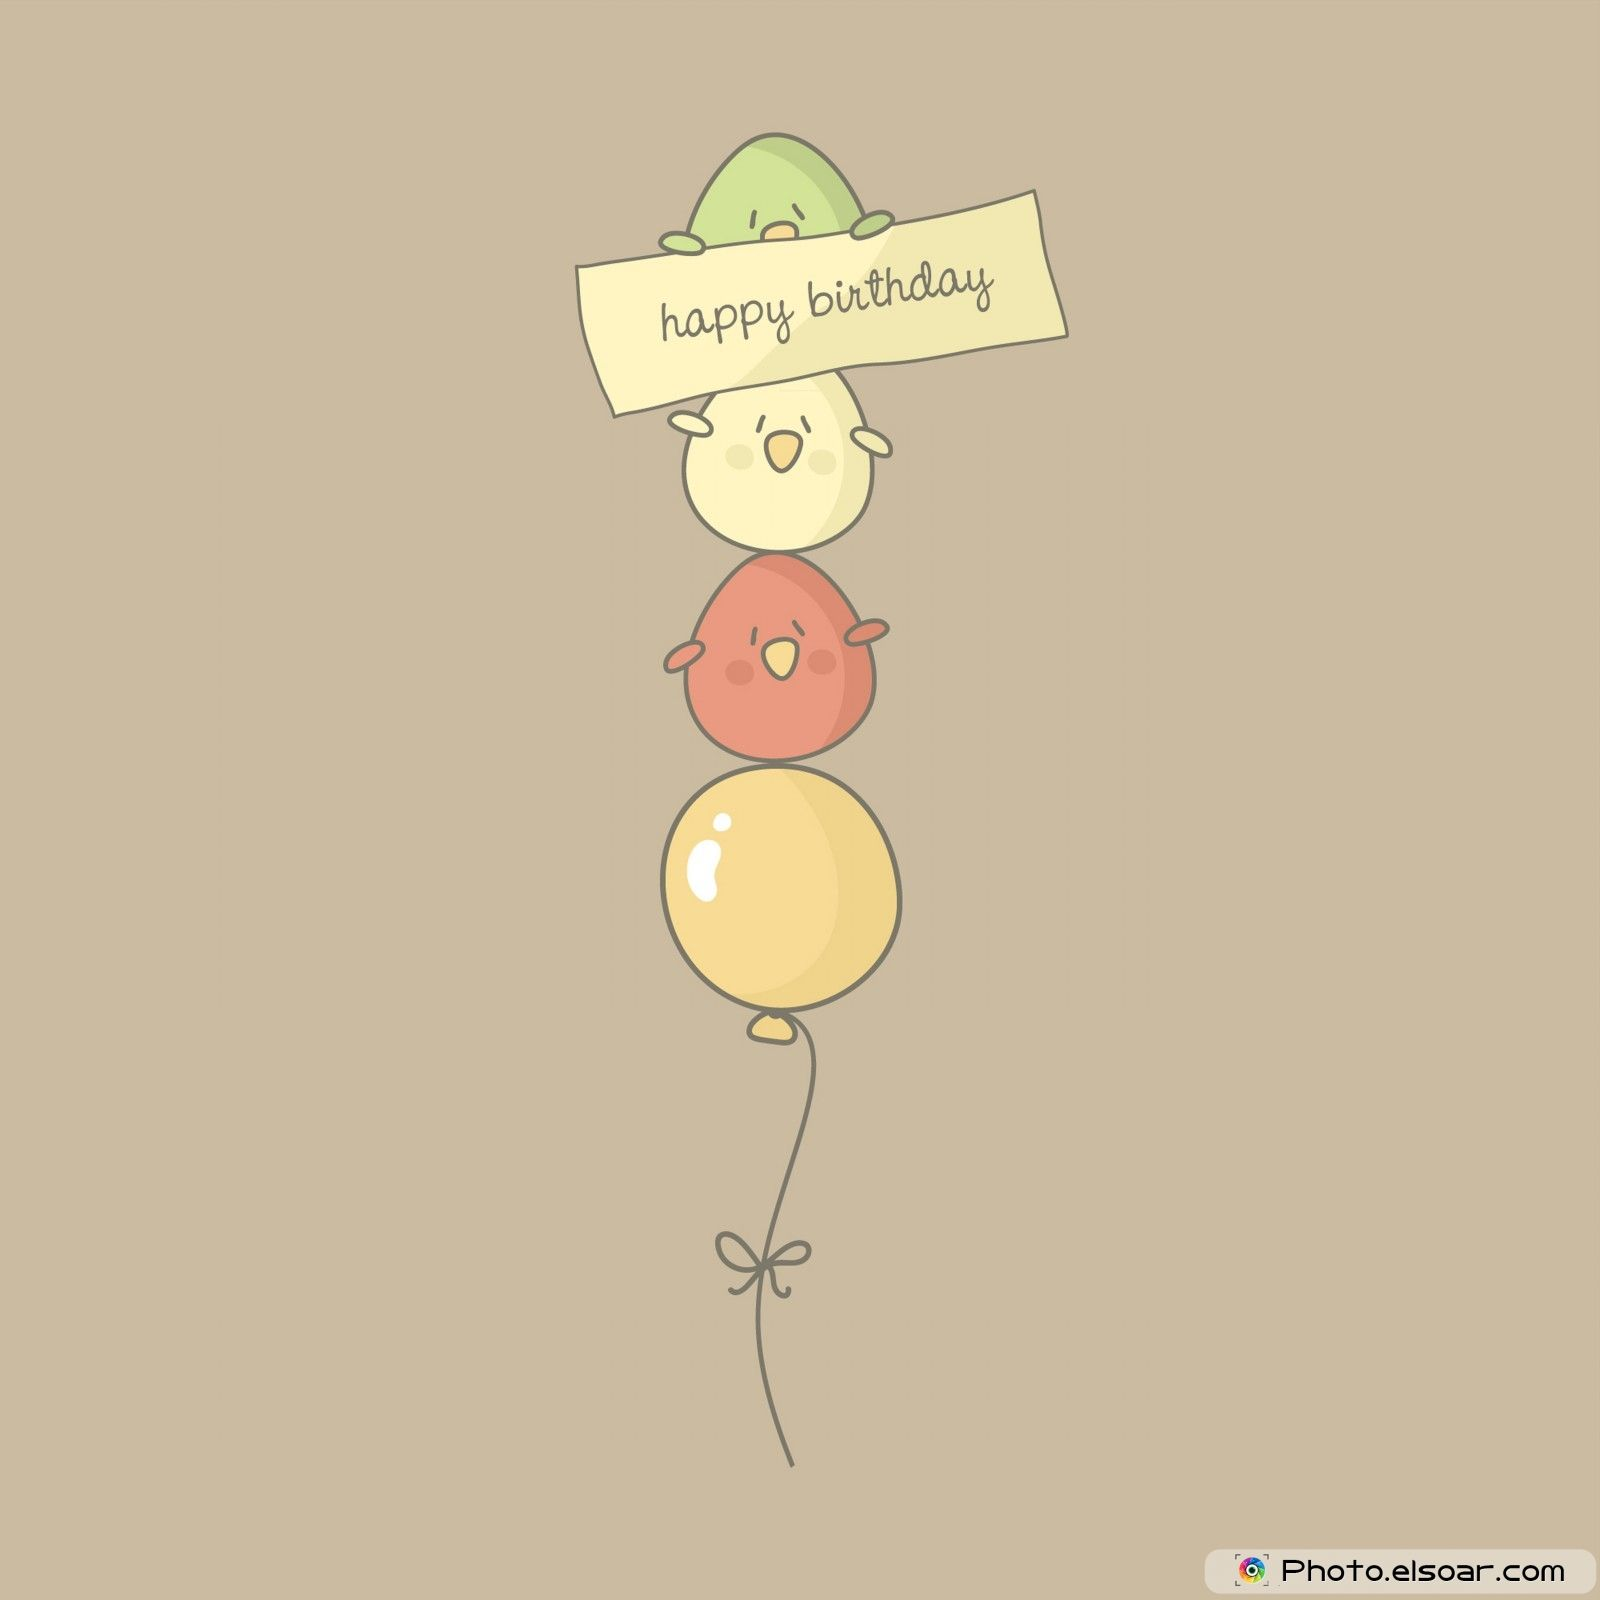 Birthday Card With Cute Birds Flying On A Balloon Happy Bday